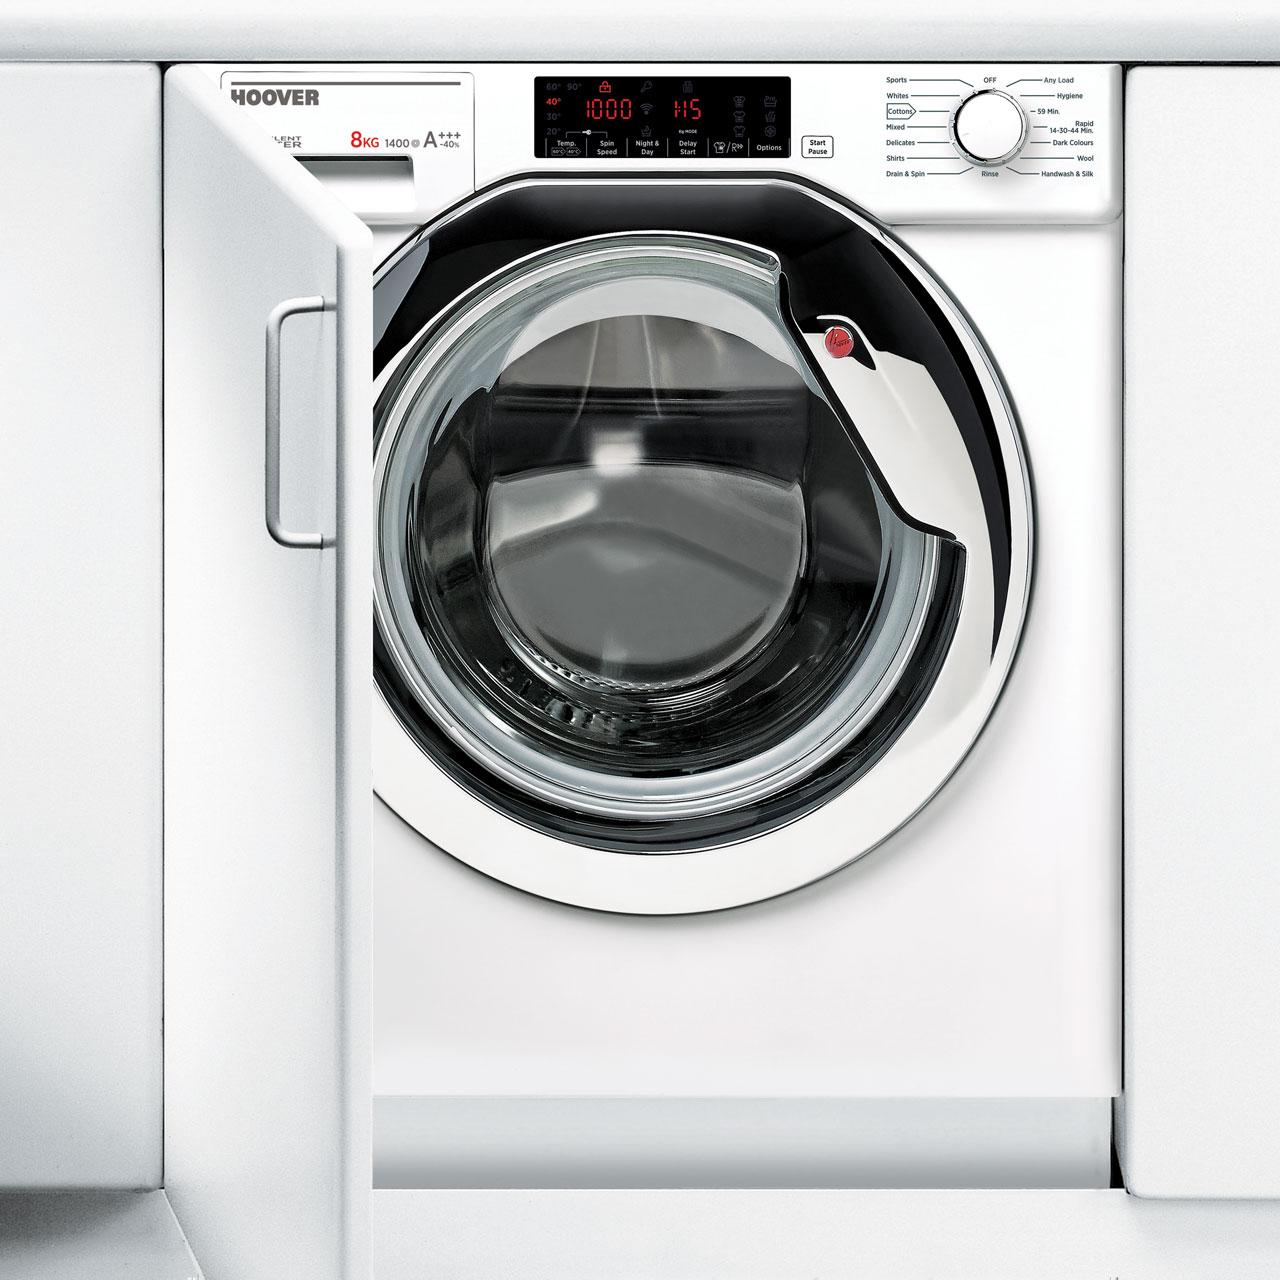 Wiring Diagram Candy Washing Machine : Wiring diagram for hoover washing machine images